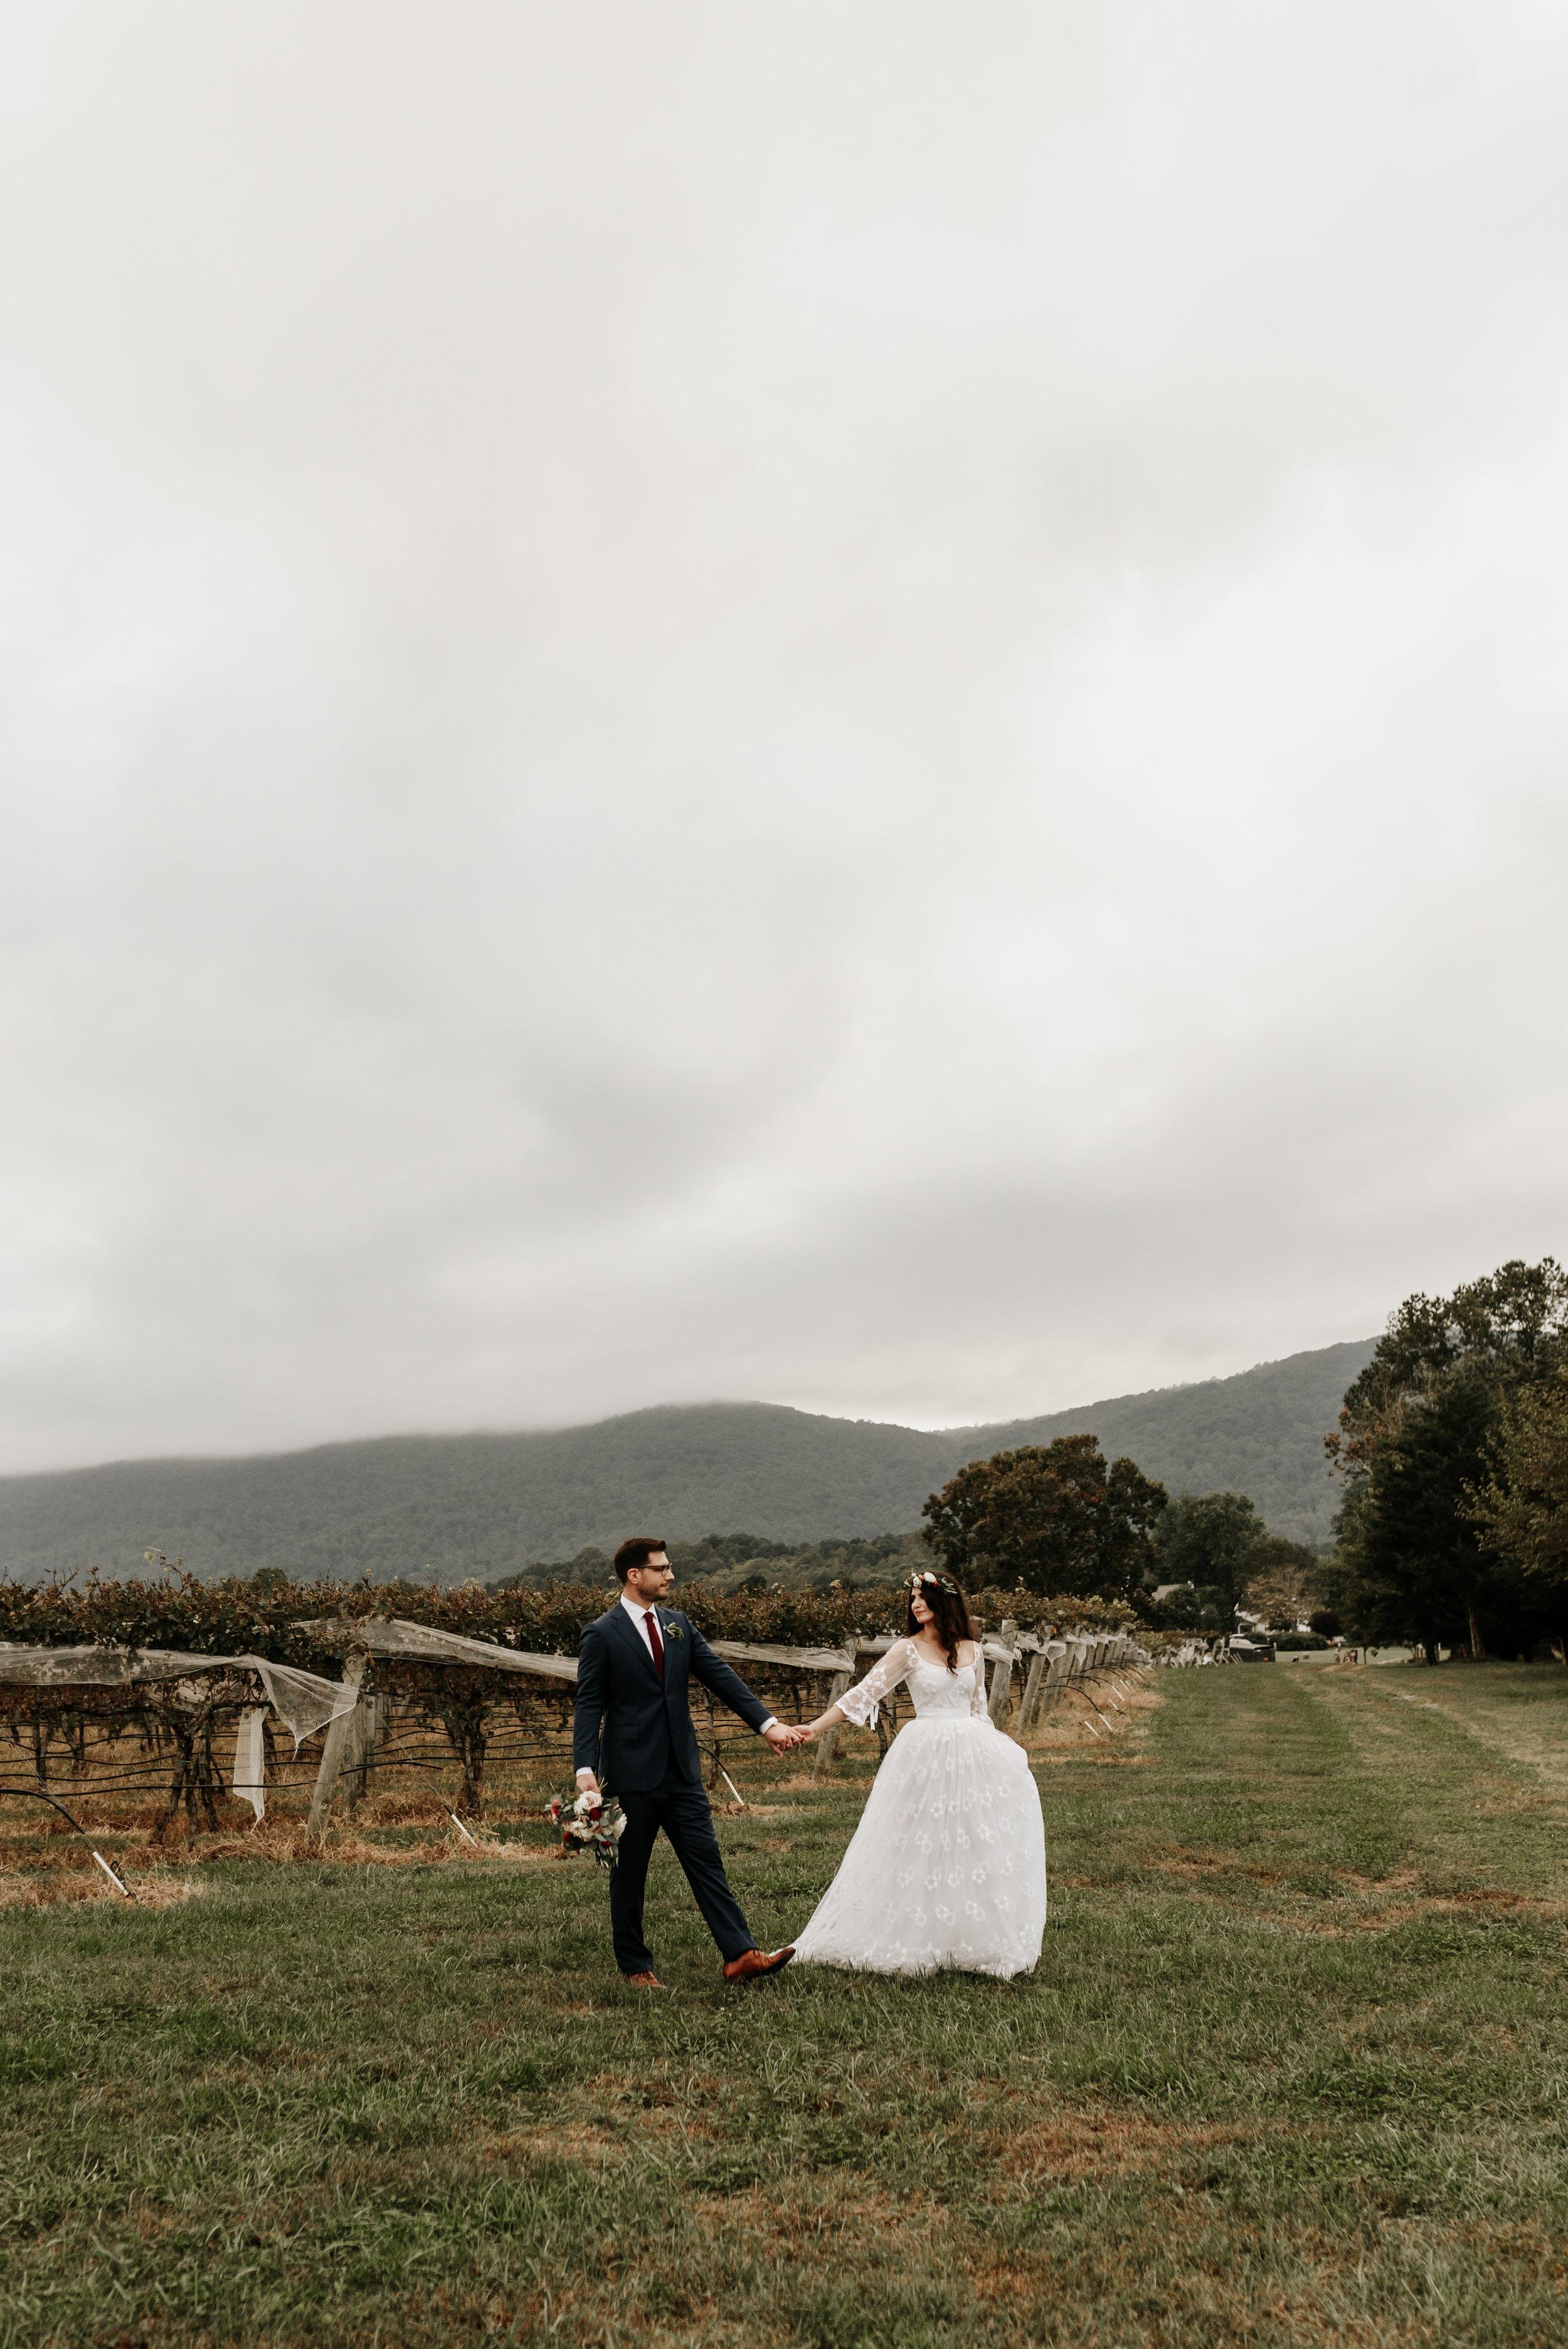 Veritas-Vineyards-and-Winery-Wedding-Photography-Afton-Virginia-Yasmin-Seth-Photography-by-V-9535.jpg